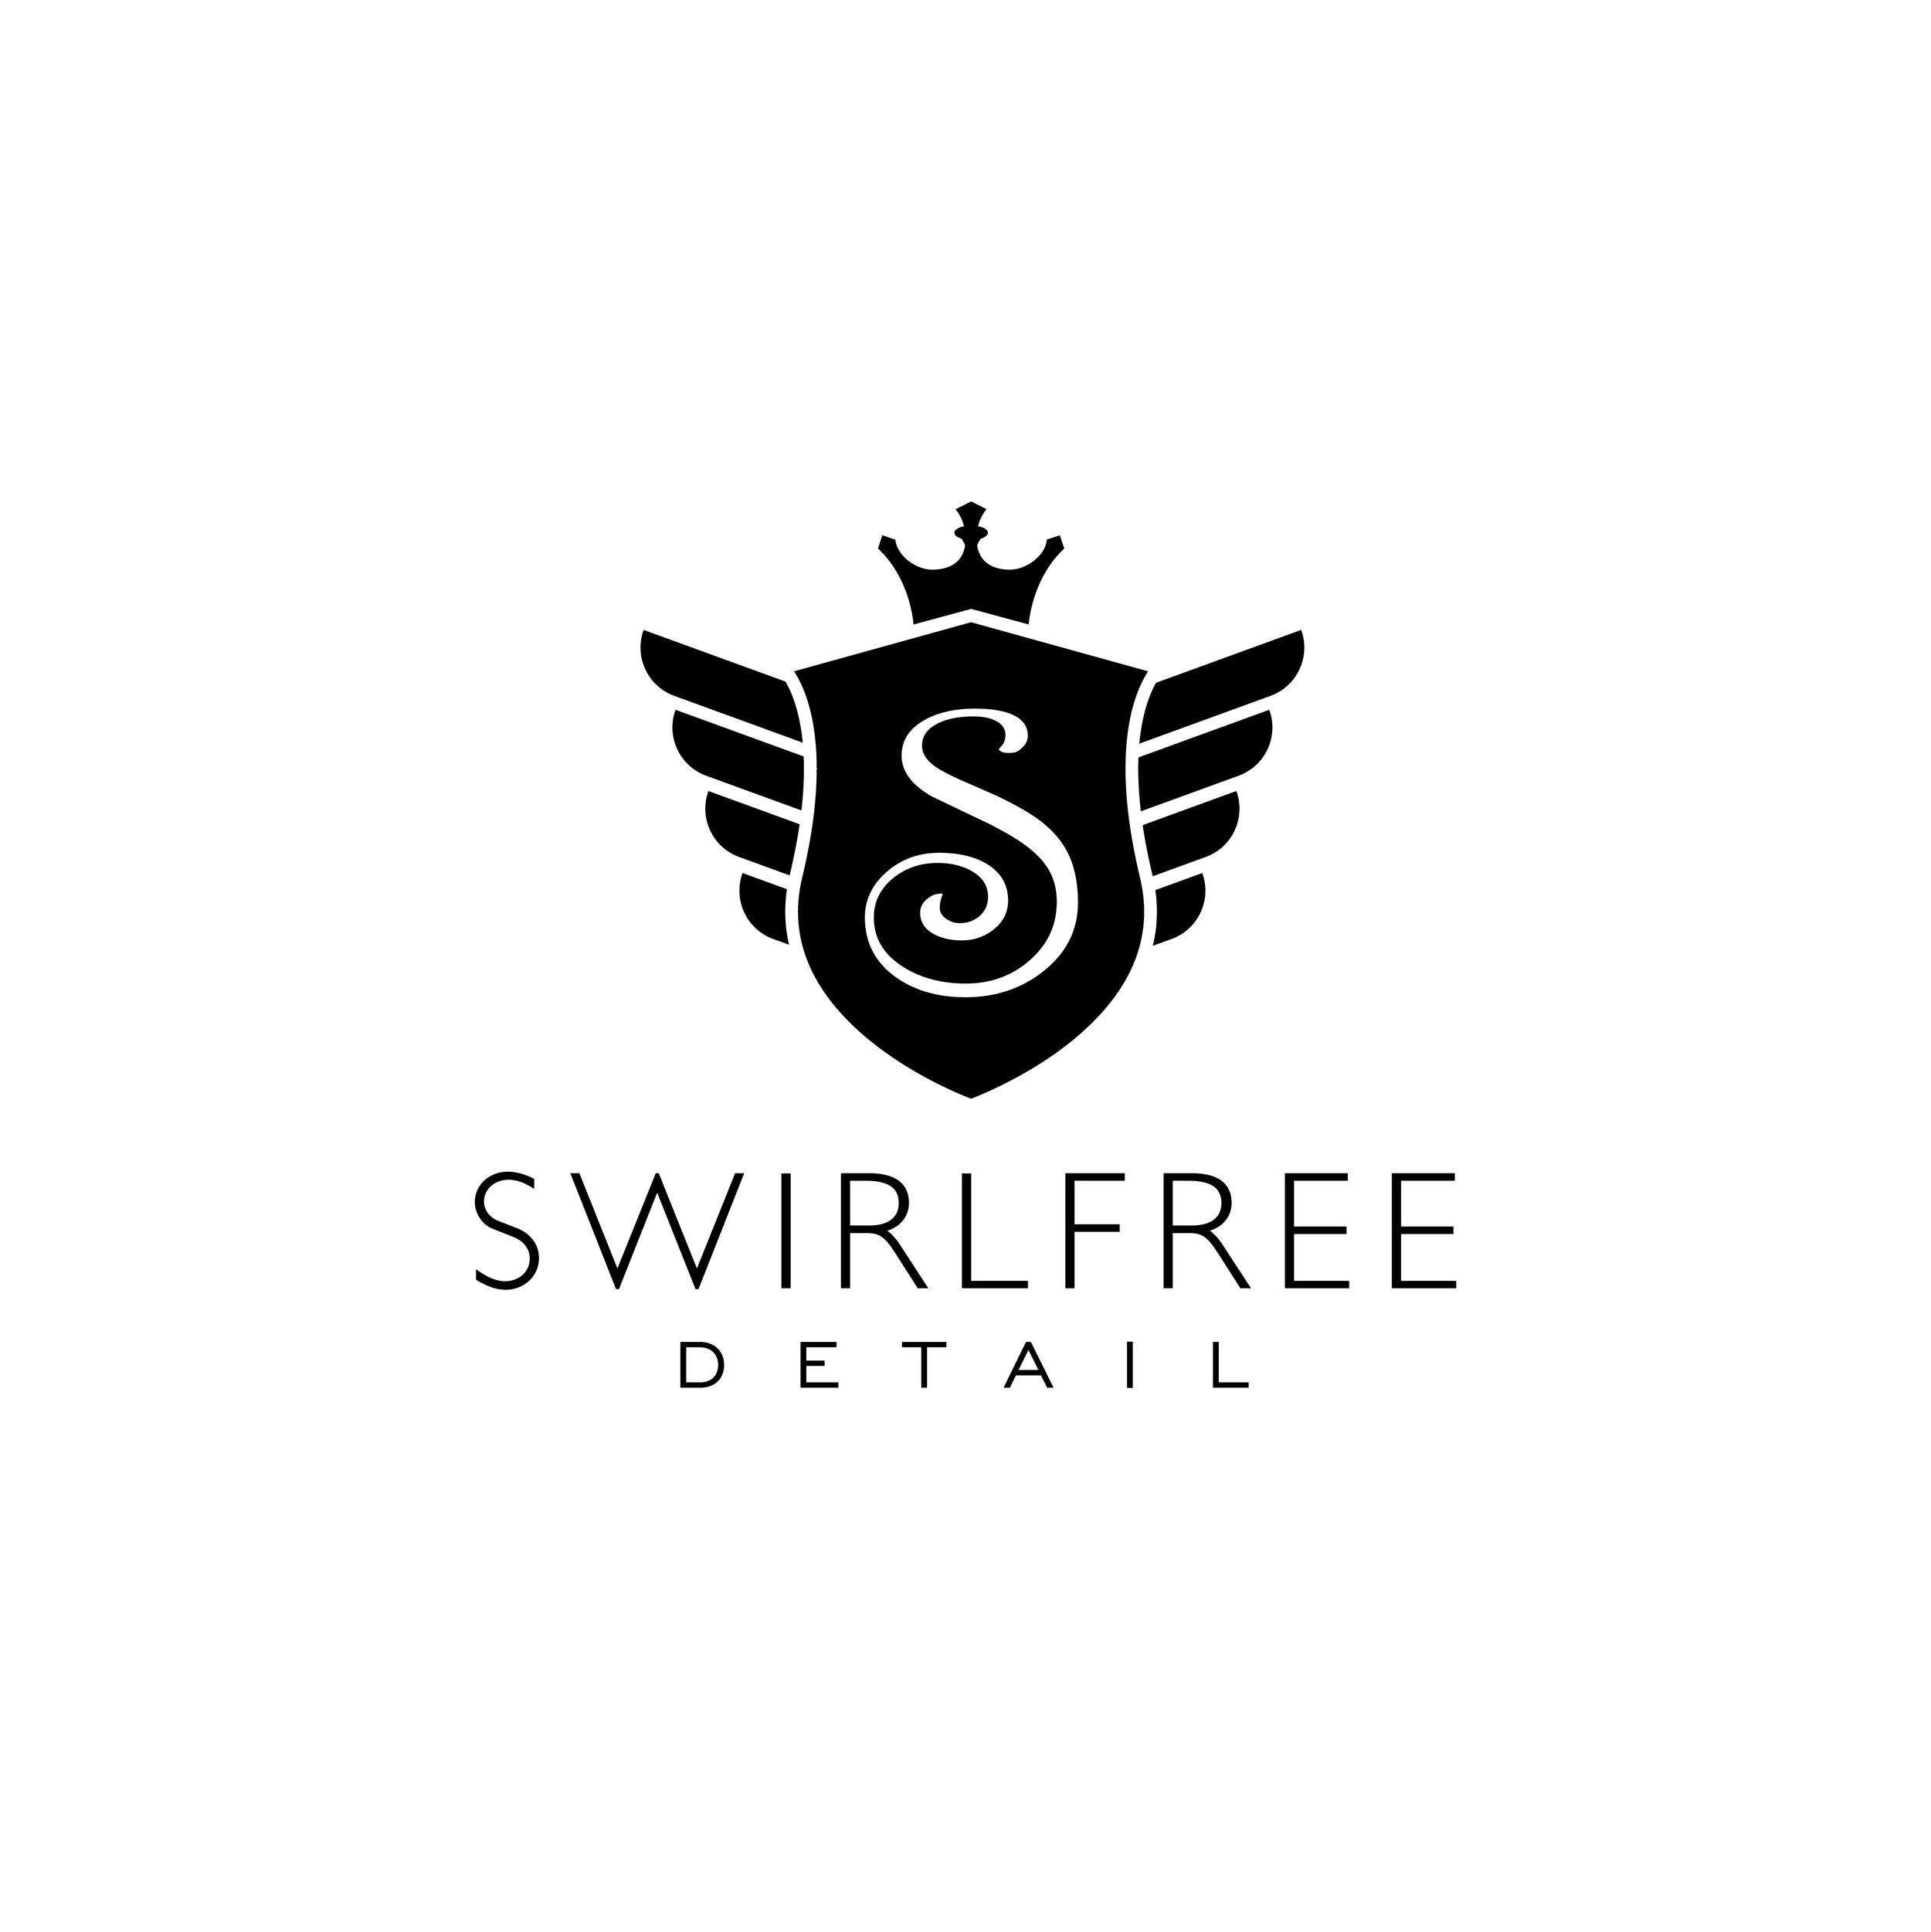 Swirlfree-Logo-Final-06.jpg